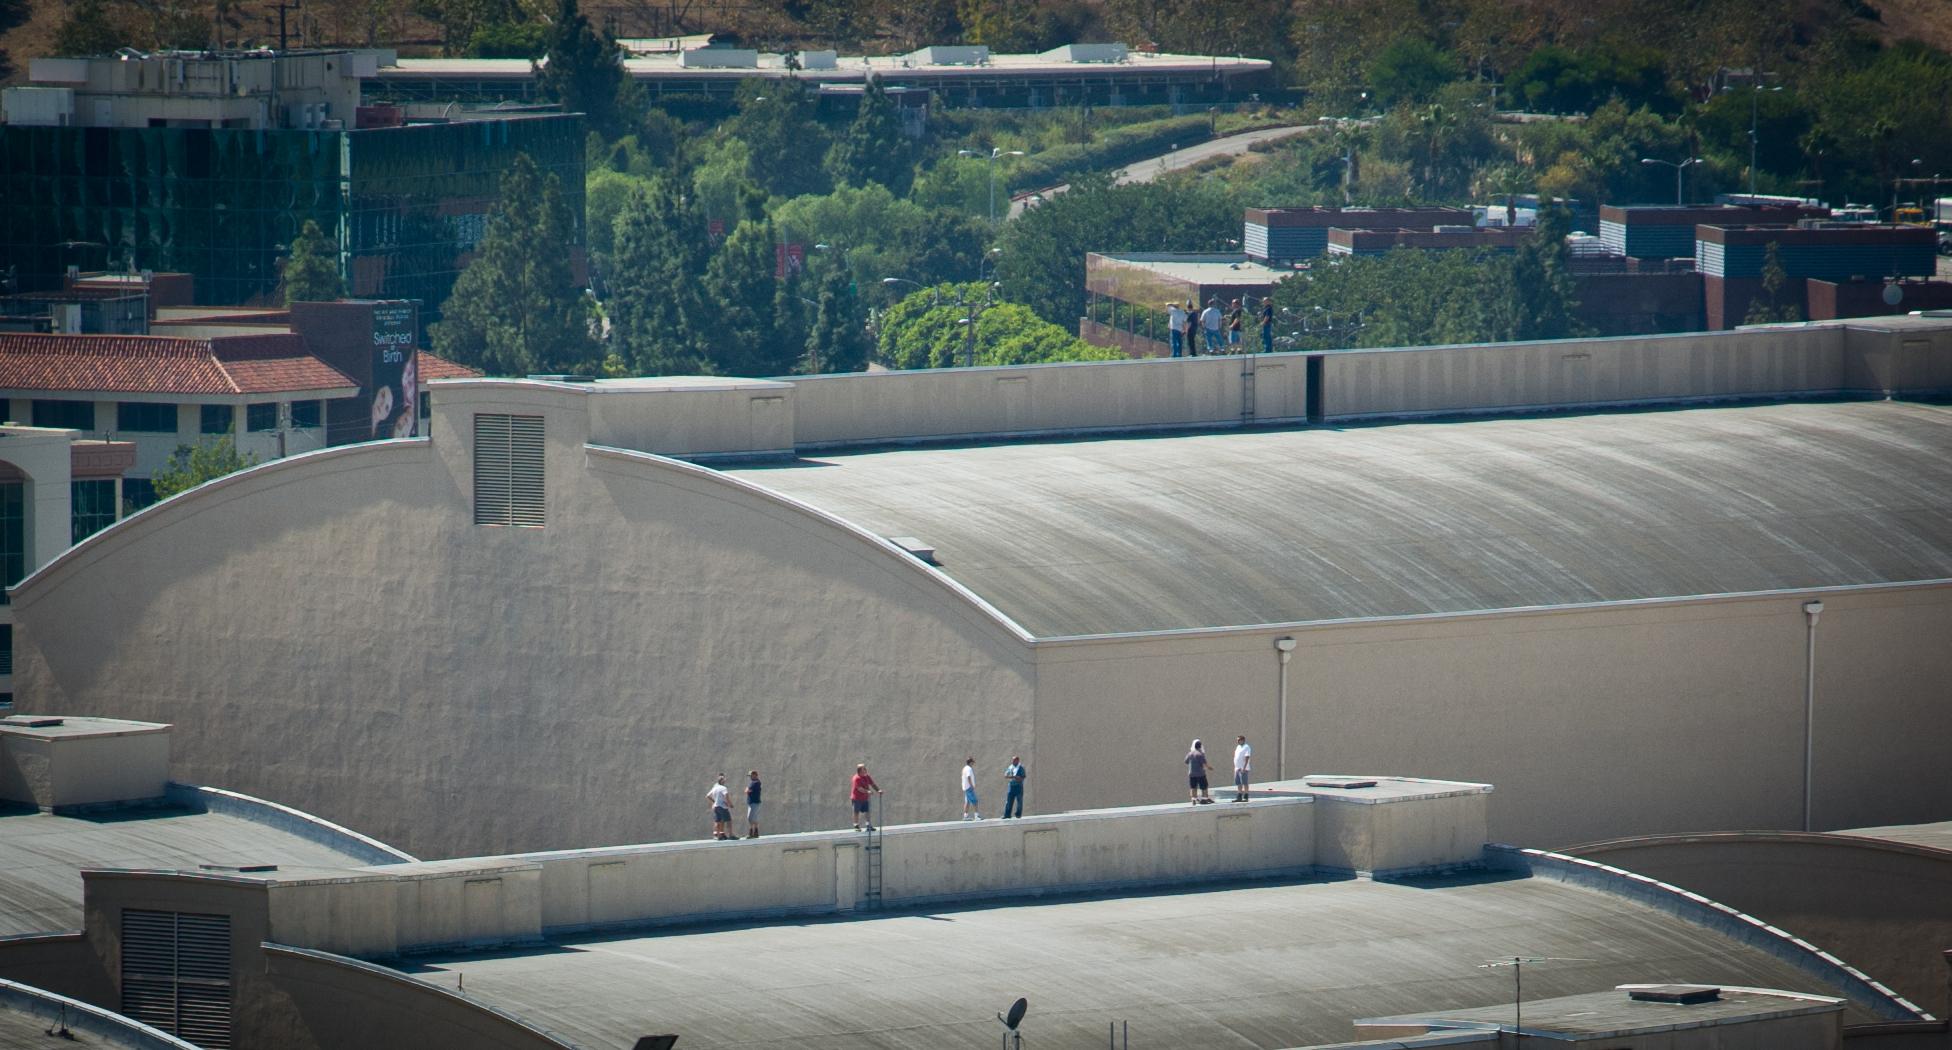 Endeavor over LA-20120921024-006.jpg